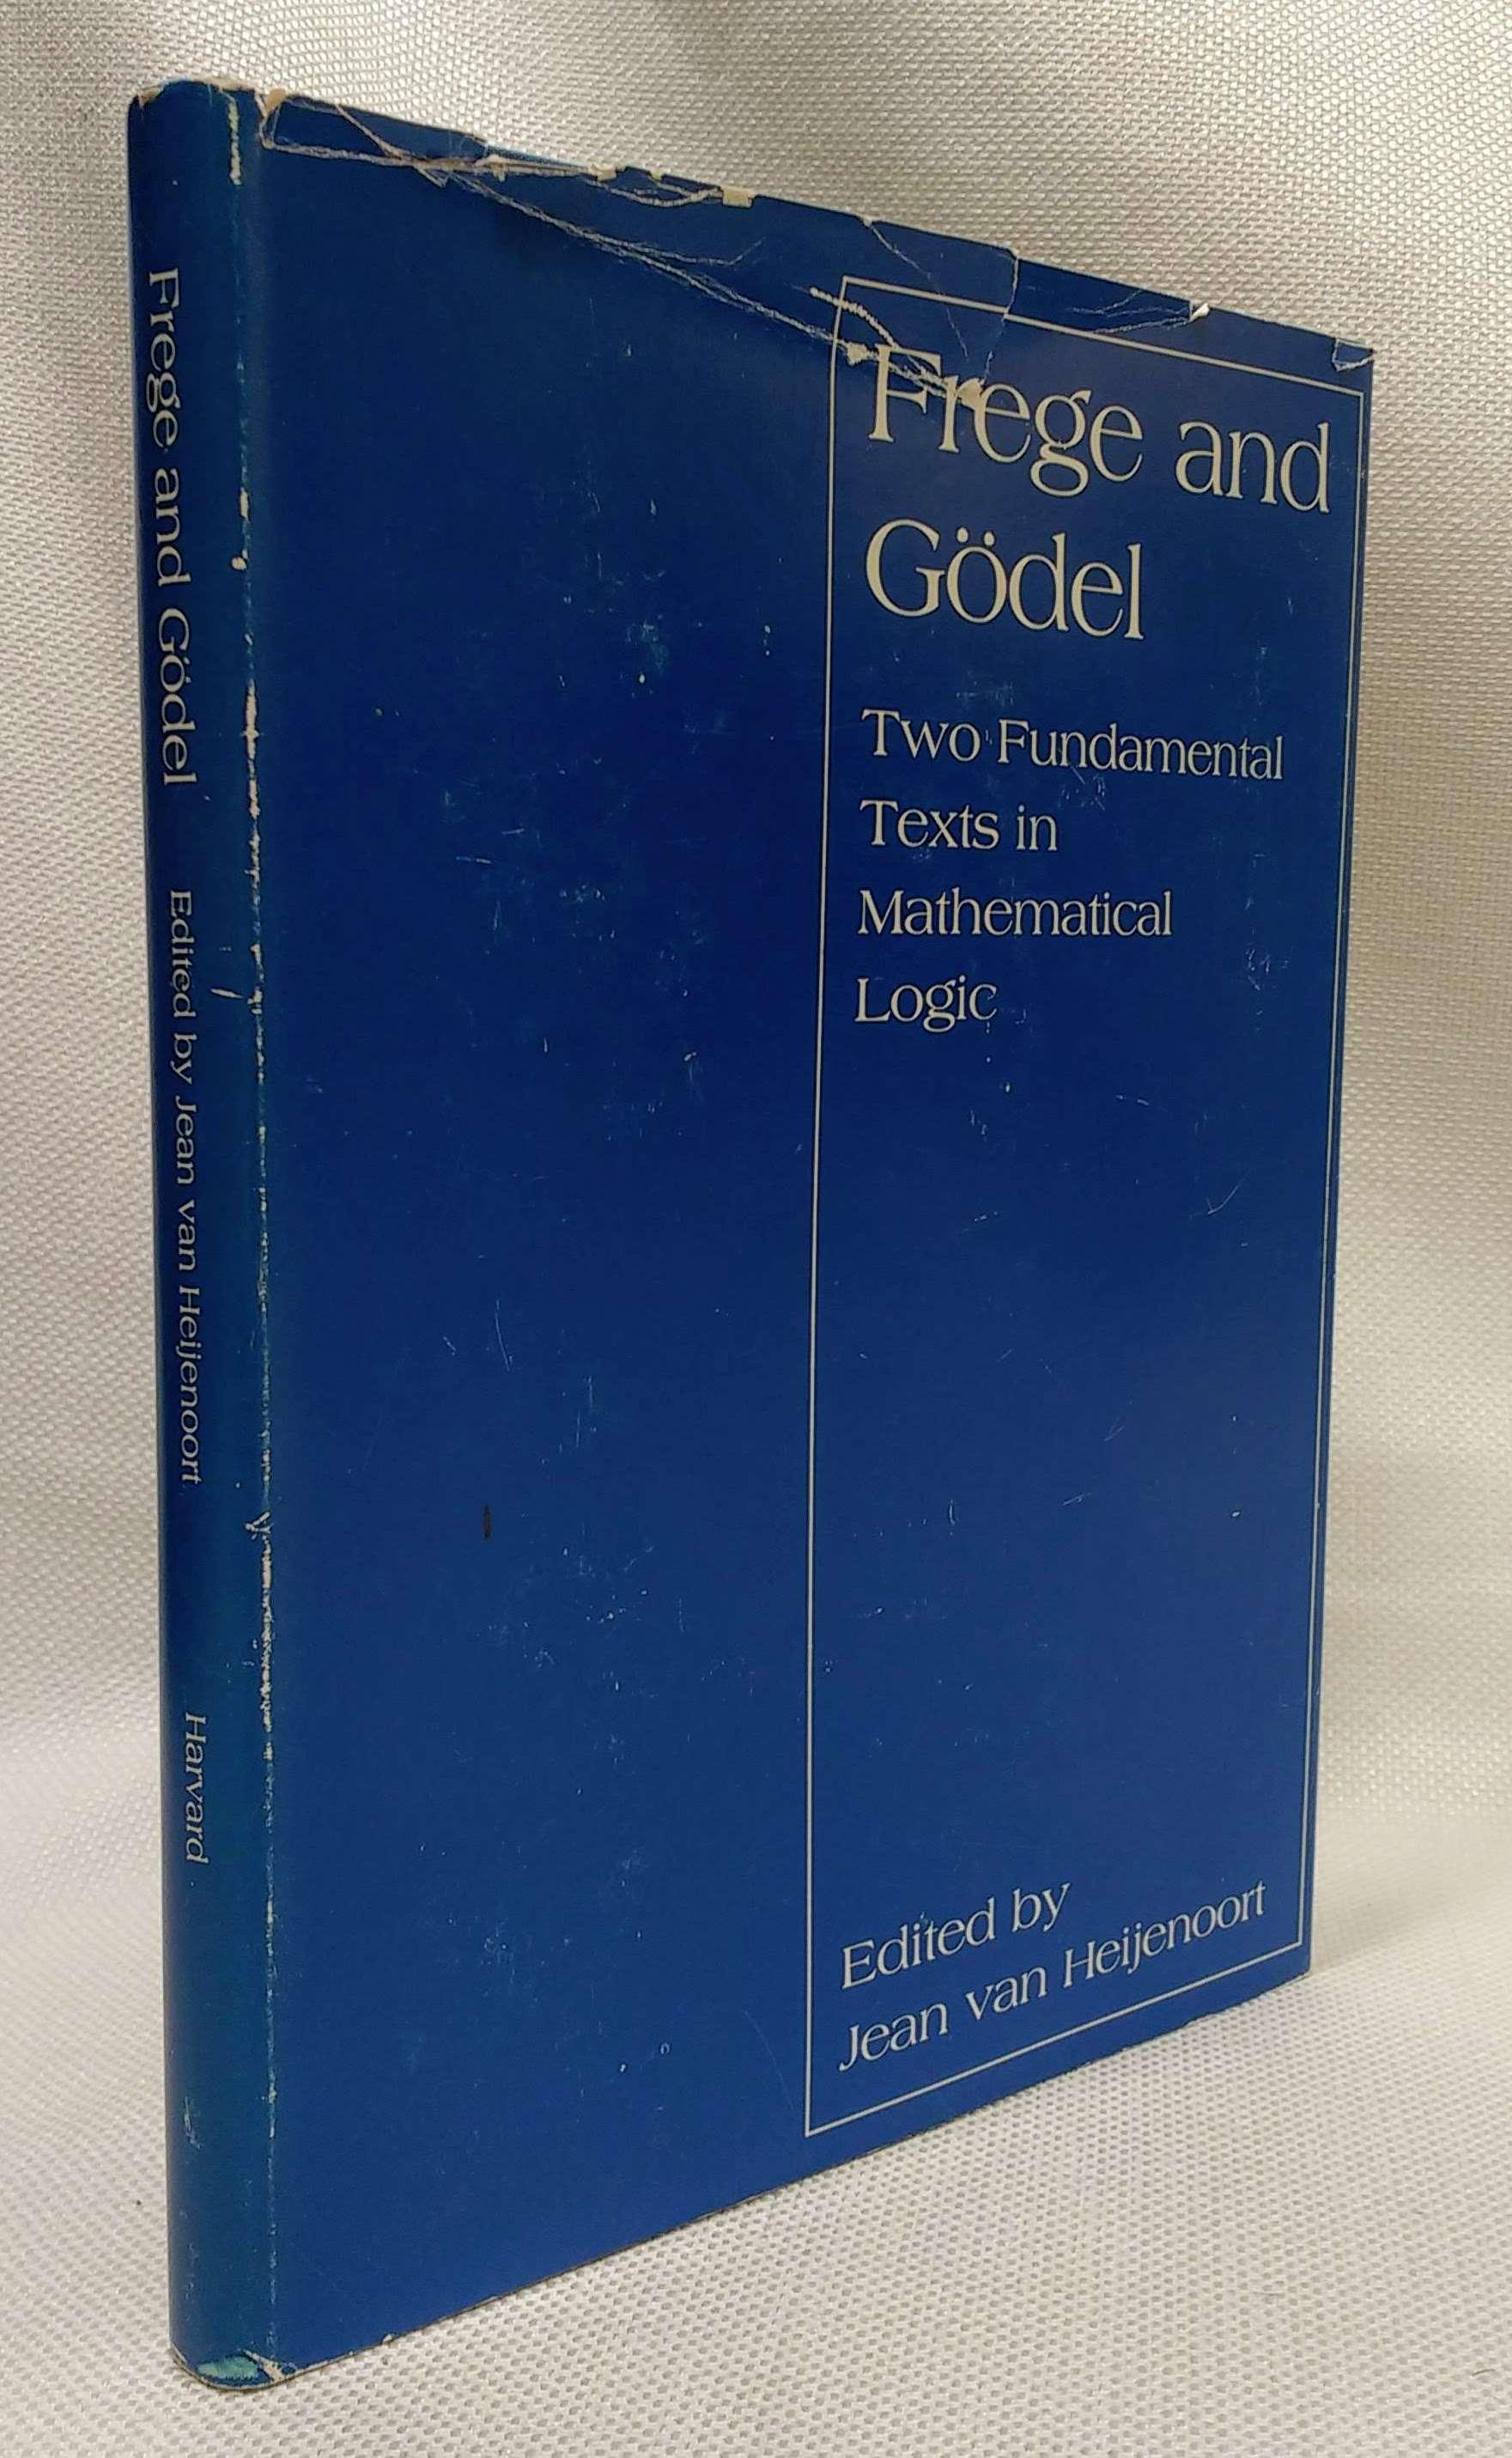 Frege and Godel: Two Fundamental Texts in Mathematical Logic, Van Heijenoort, Jean